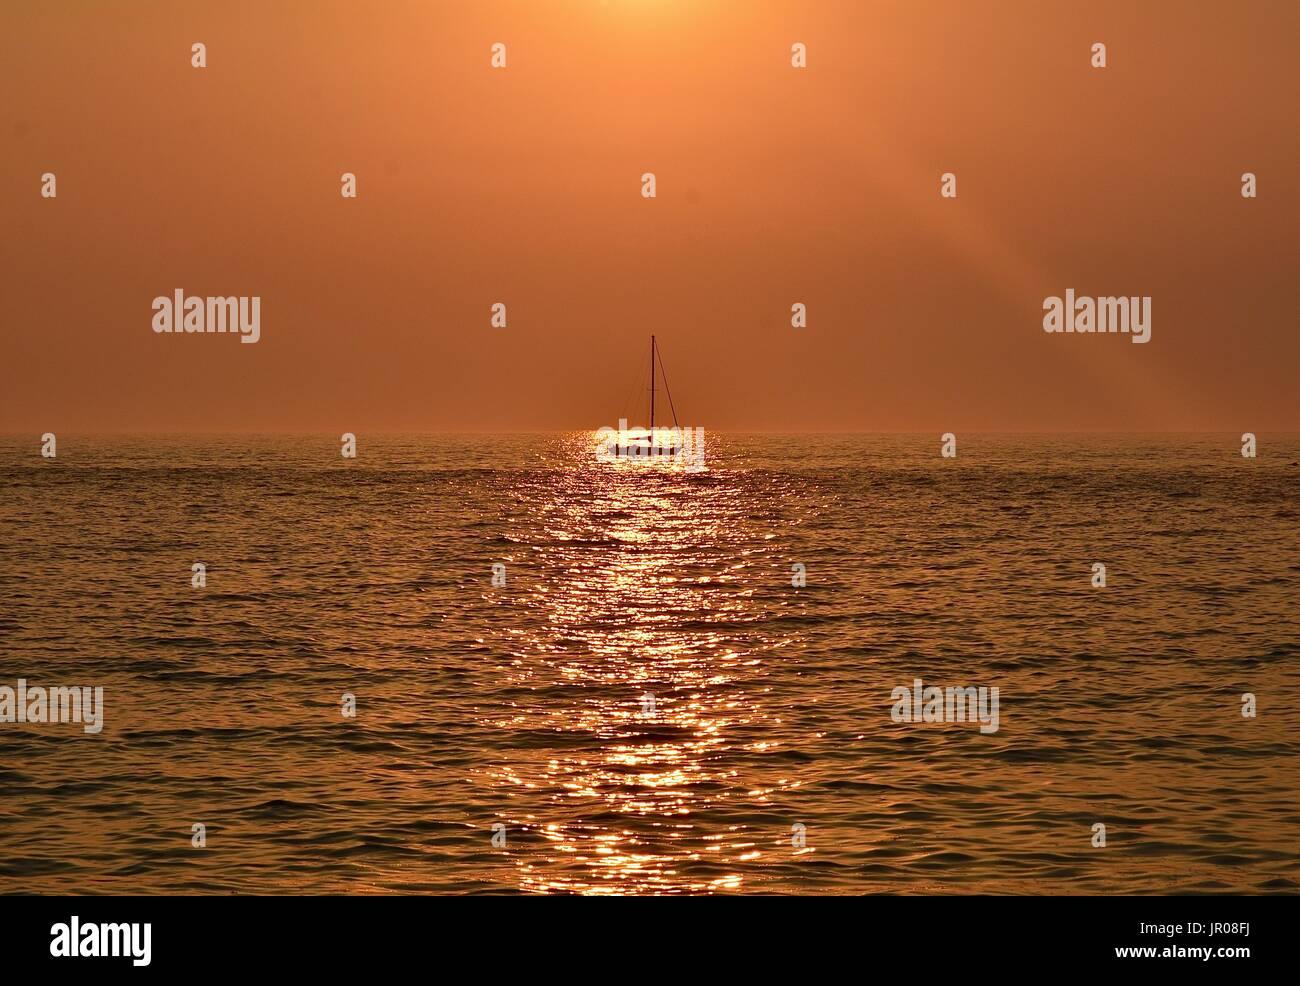 Sunset - Stock Image